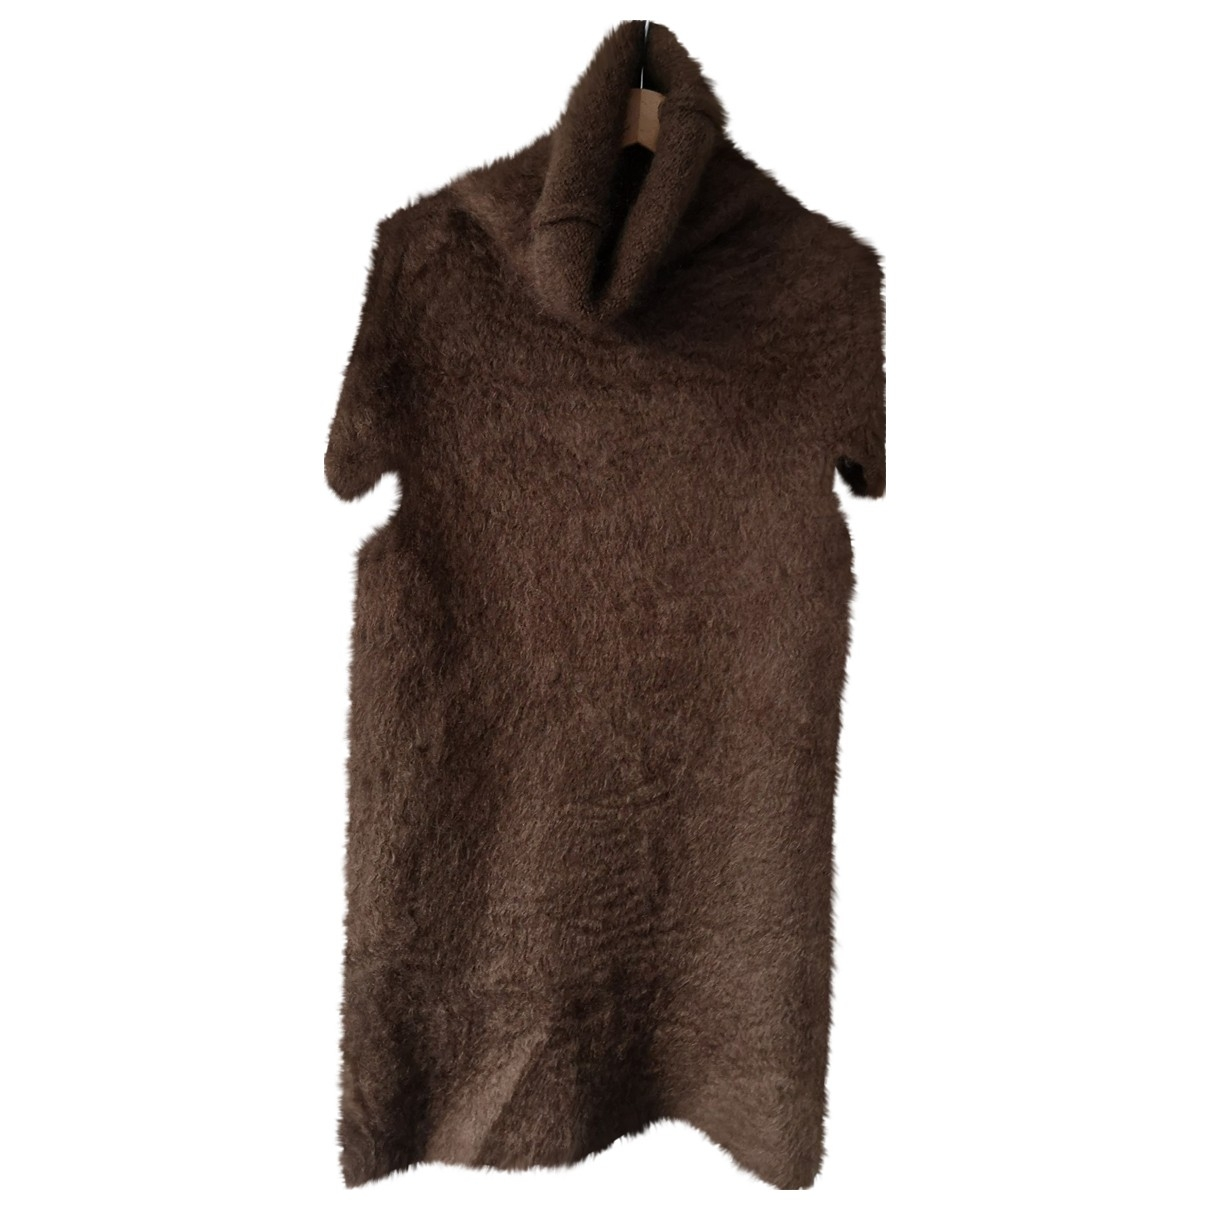 Maison Martin Margiela \N Brown Wool dress for Women 38 FR